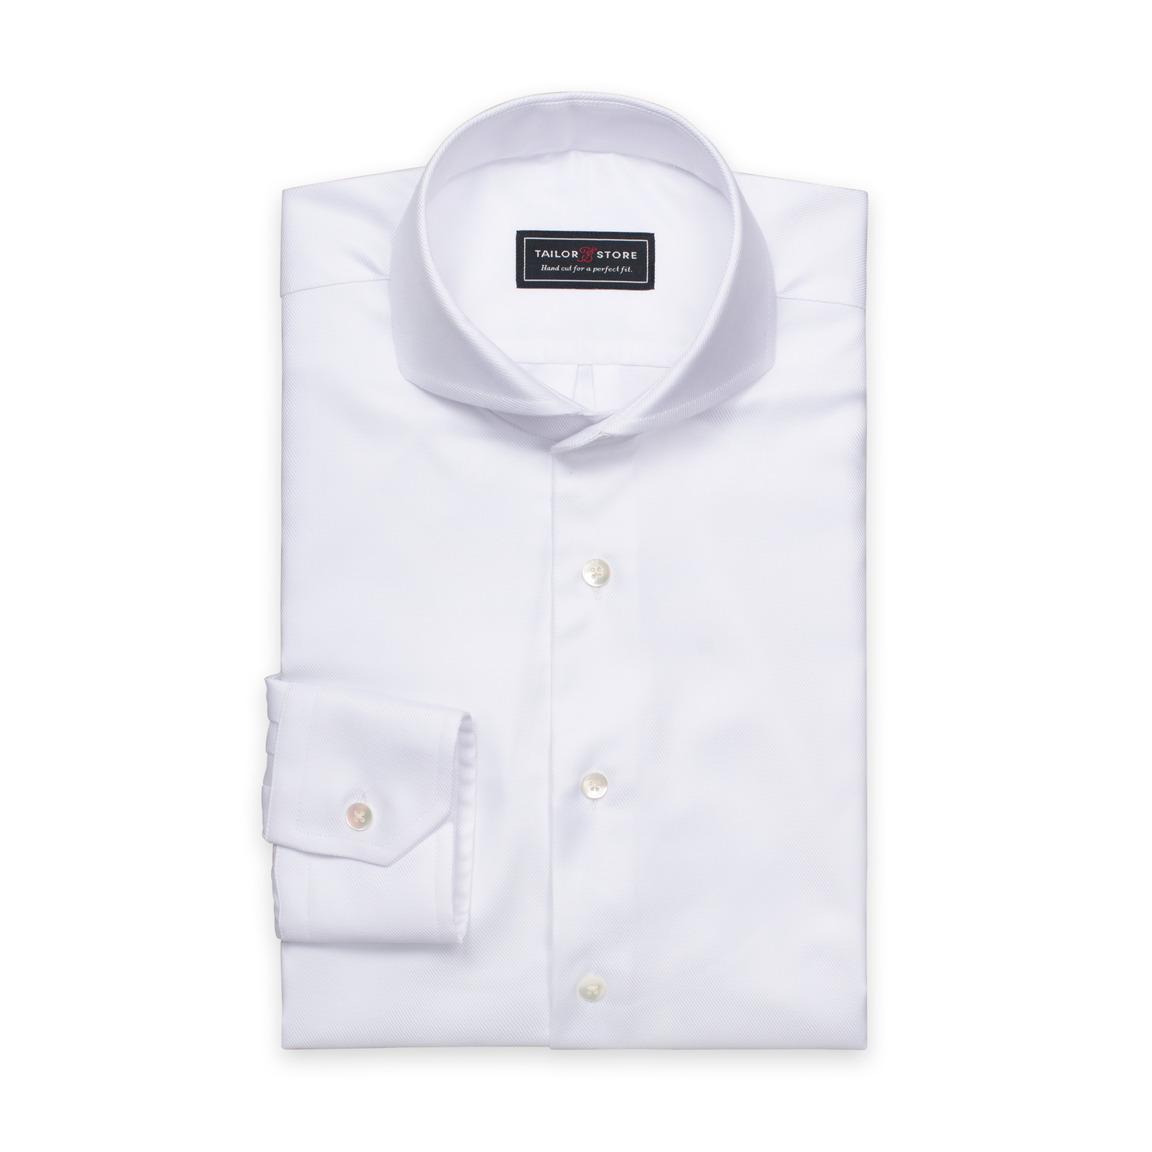 Biała, twillowa koszula